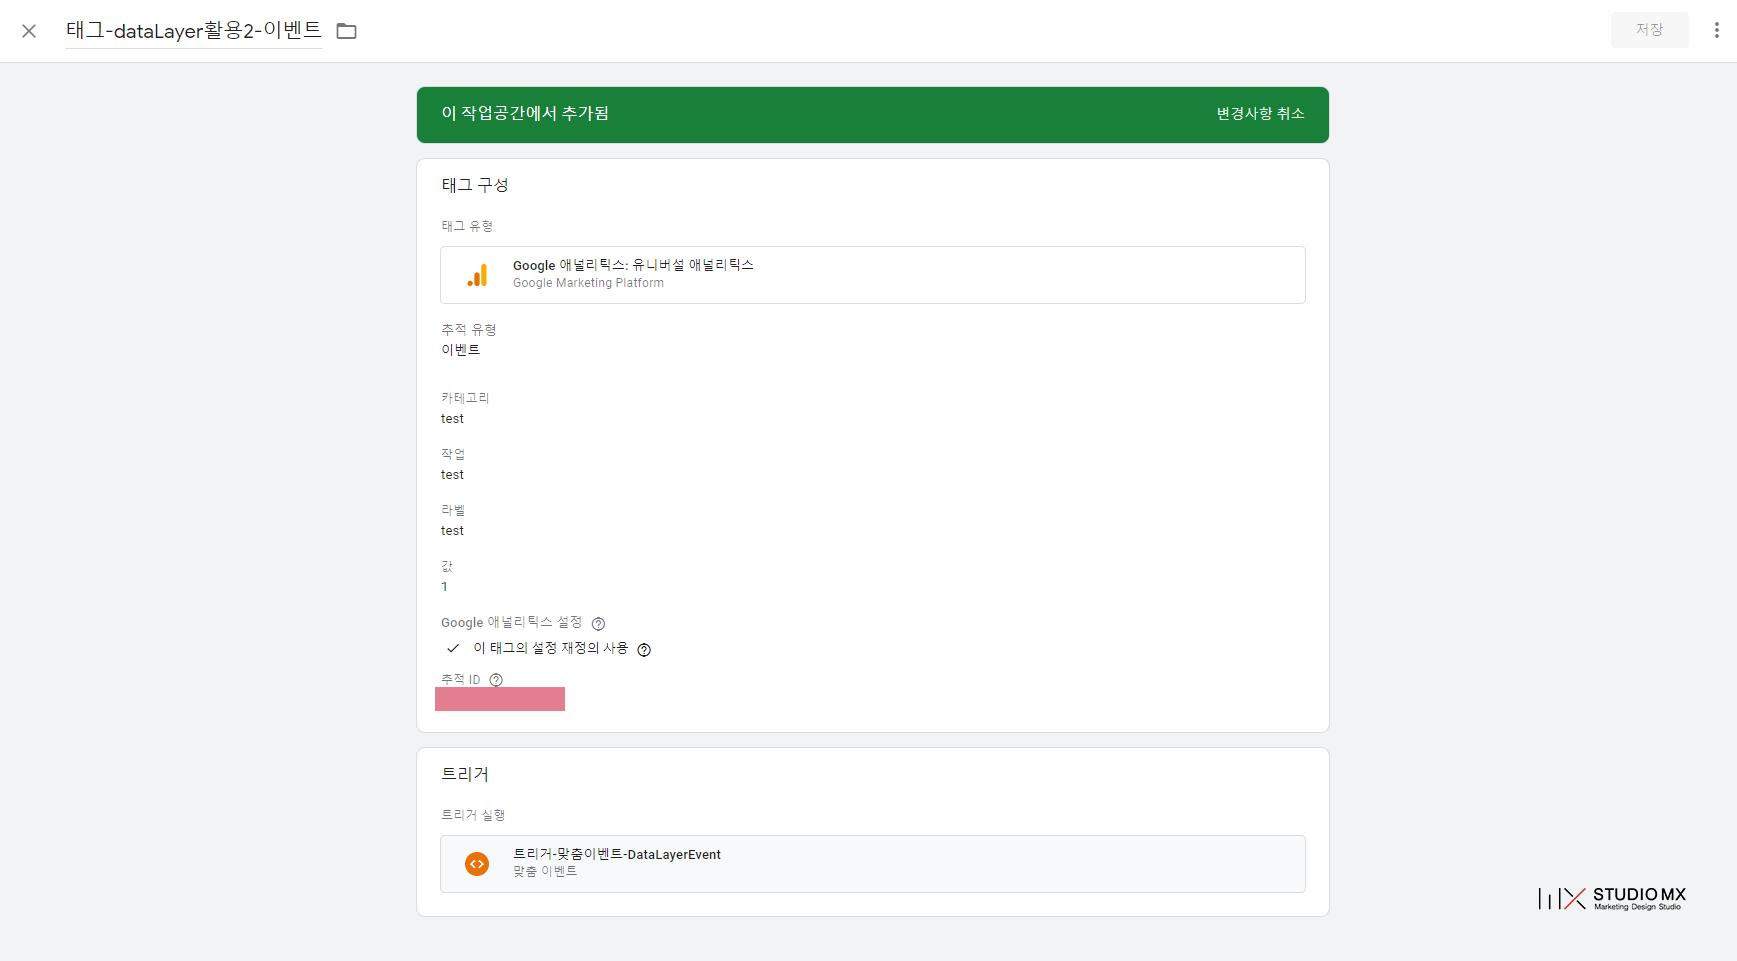 GTM강의-datalayer활용-태그설정2(이벤트)